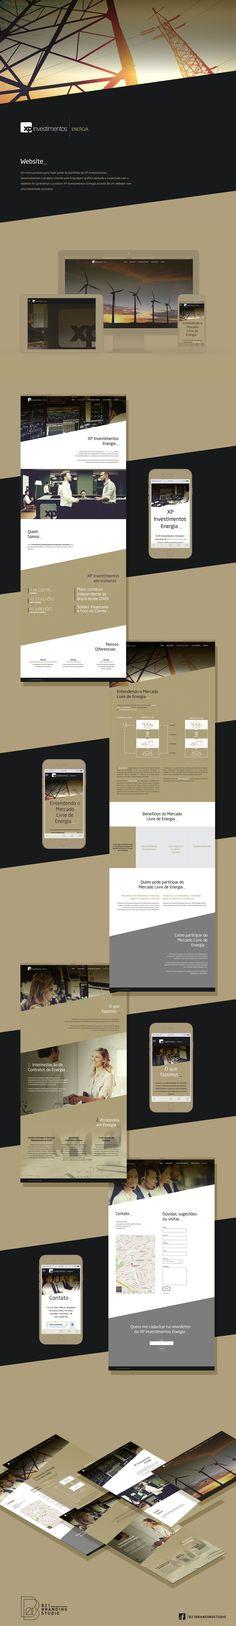 Website for XP Energia | B21 Branding Studio